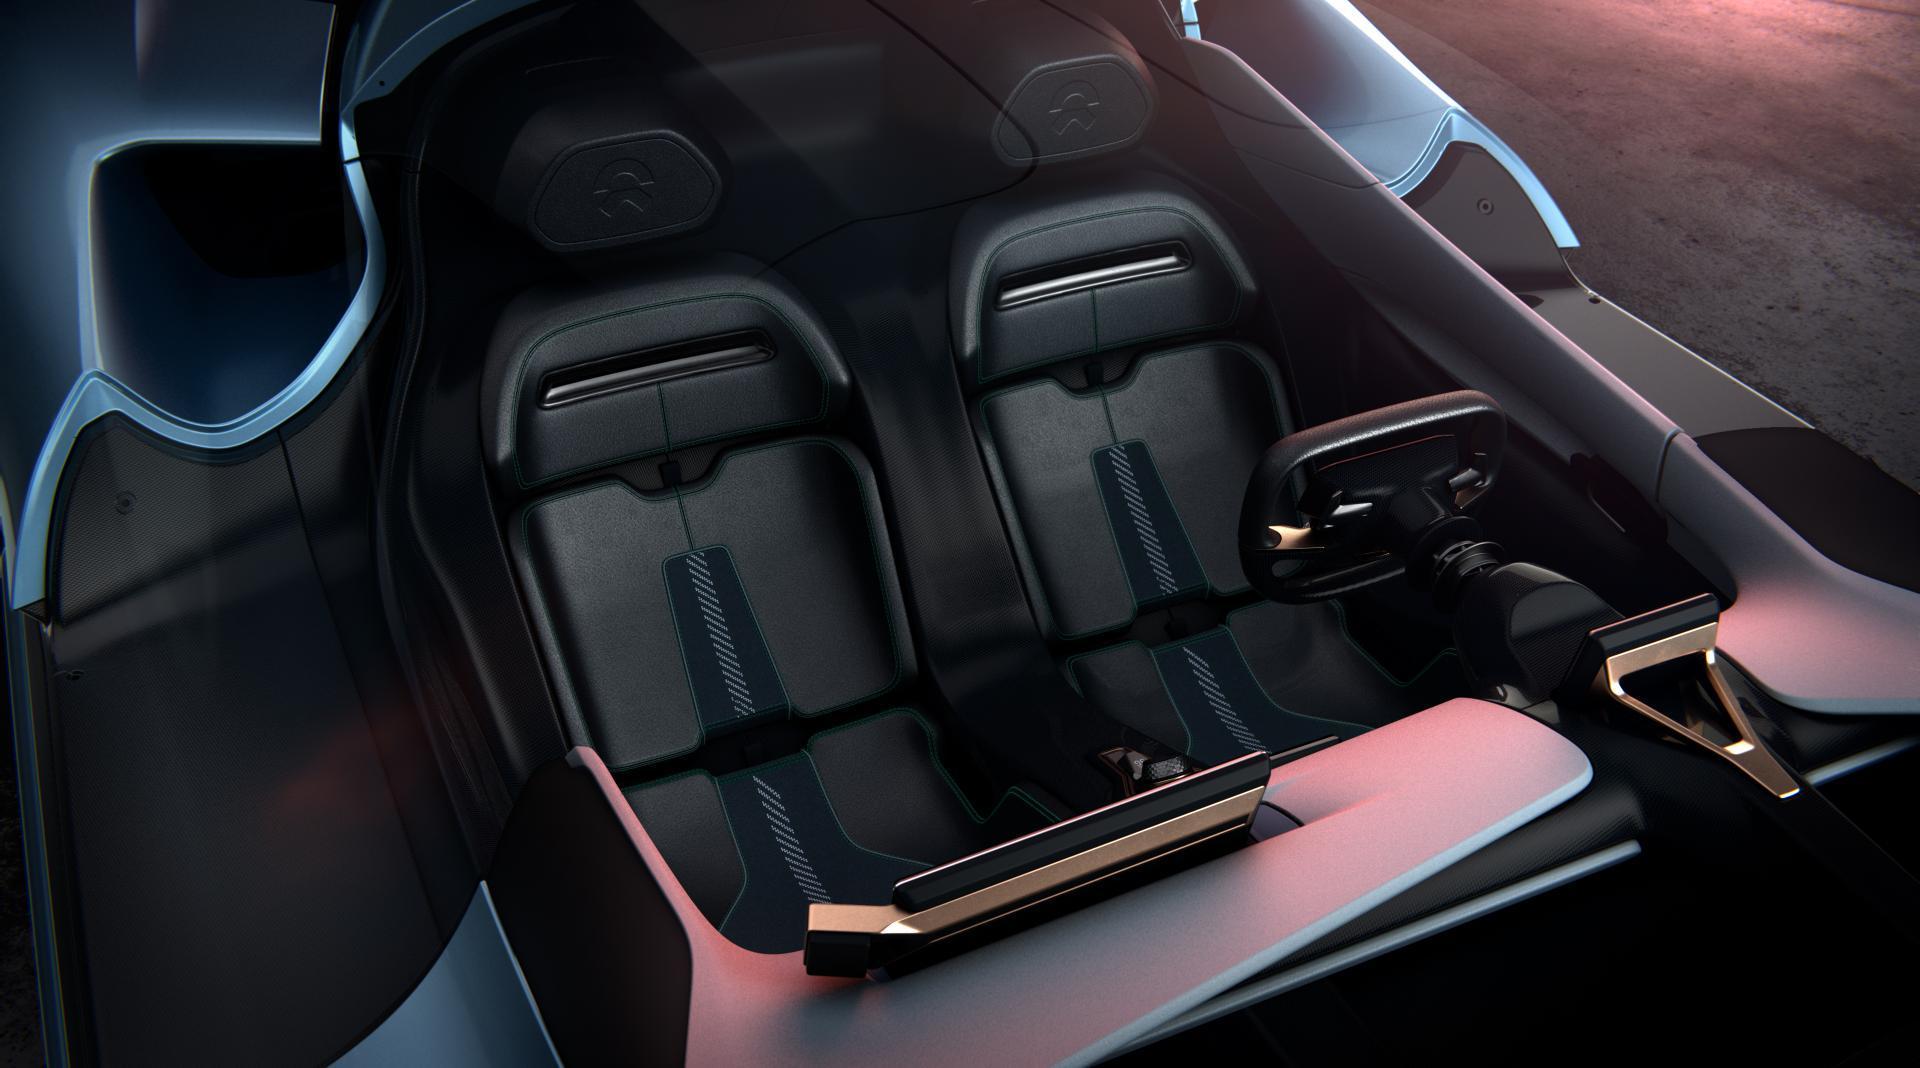 sc017nio-ep9-interior-02jpg